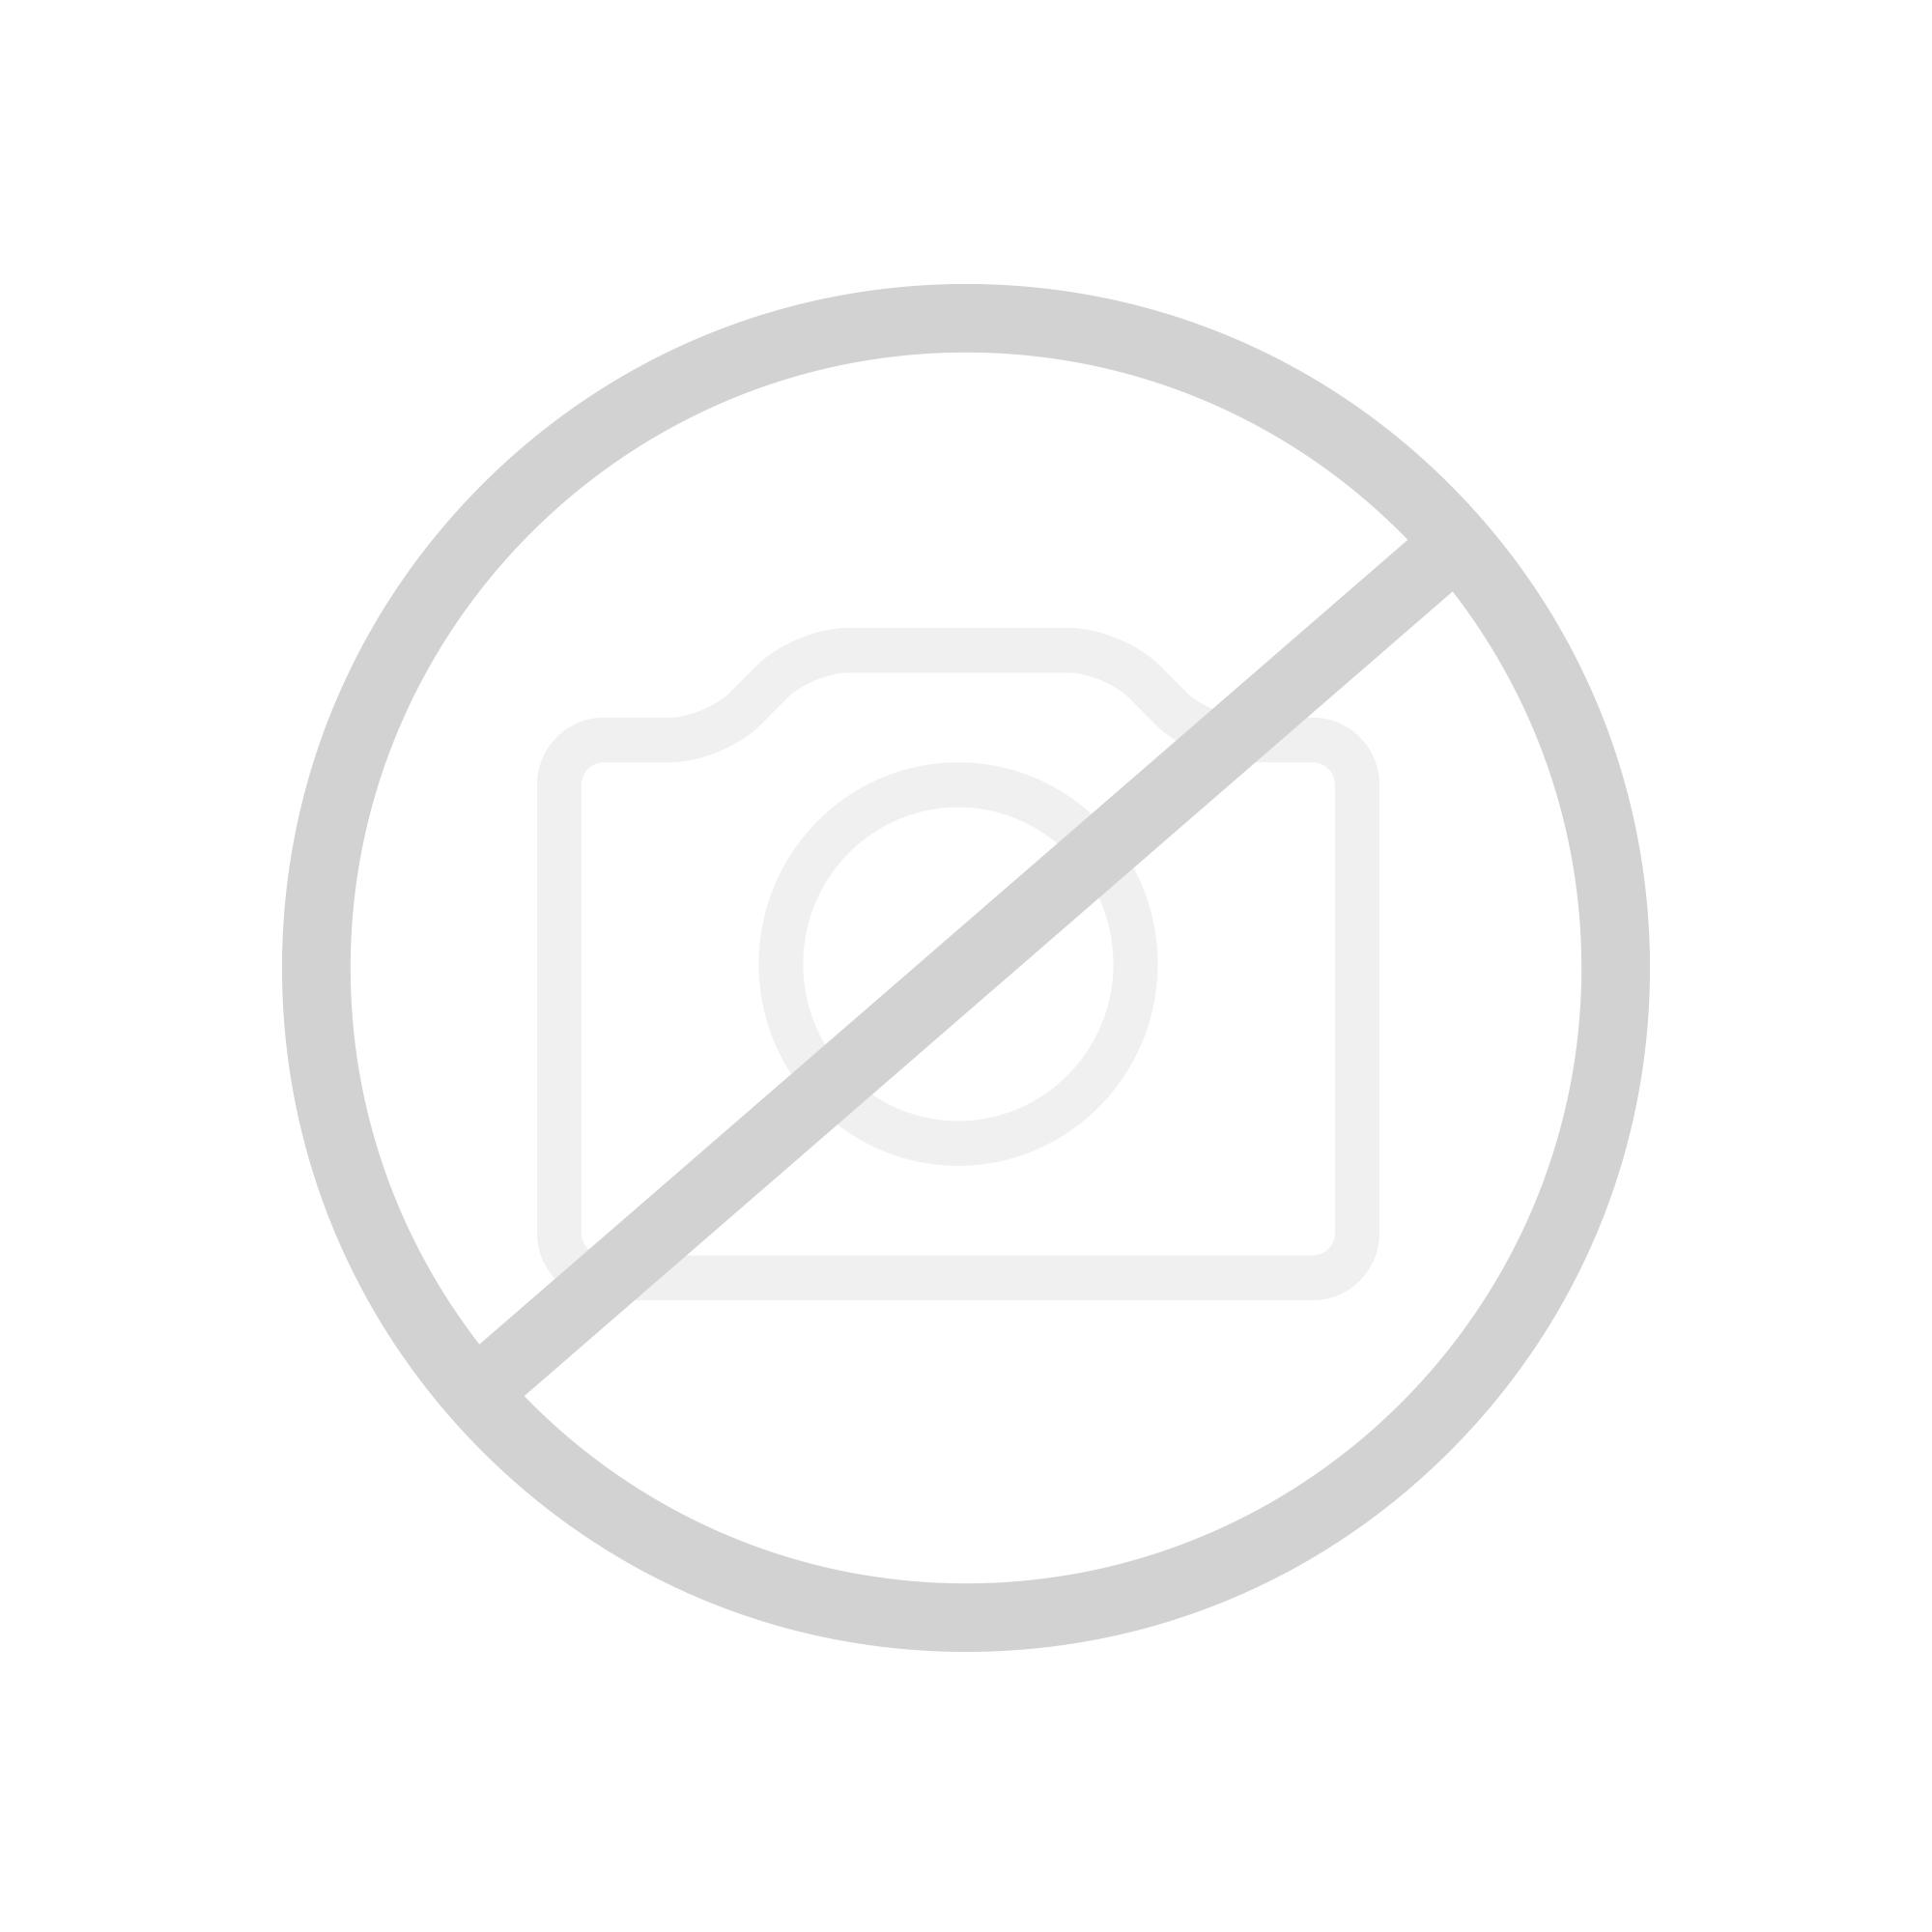 Hansgrohe Croma Select S Vario Handbrause, EcoSmart